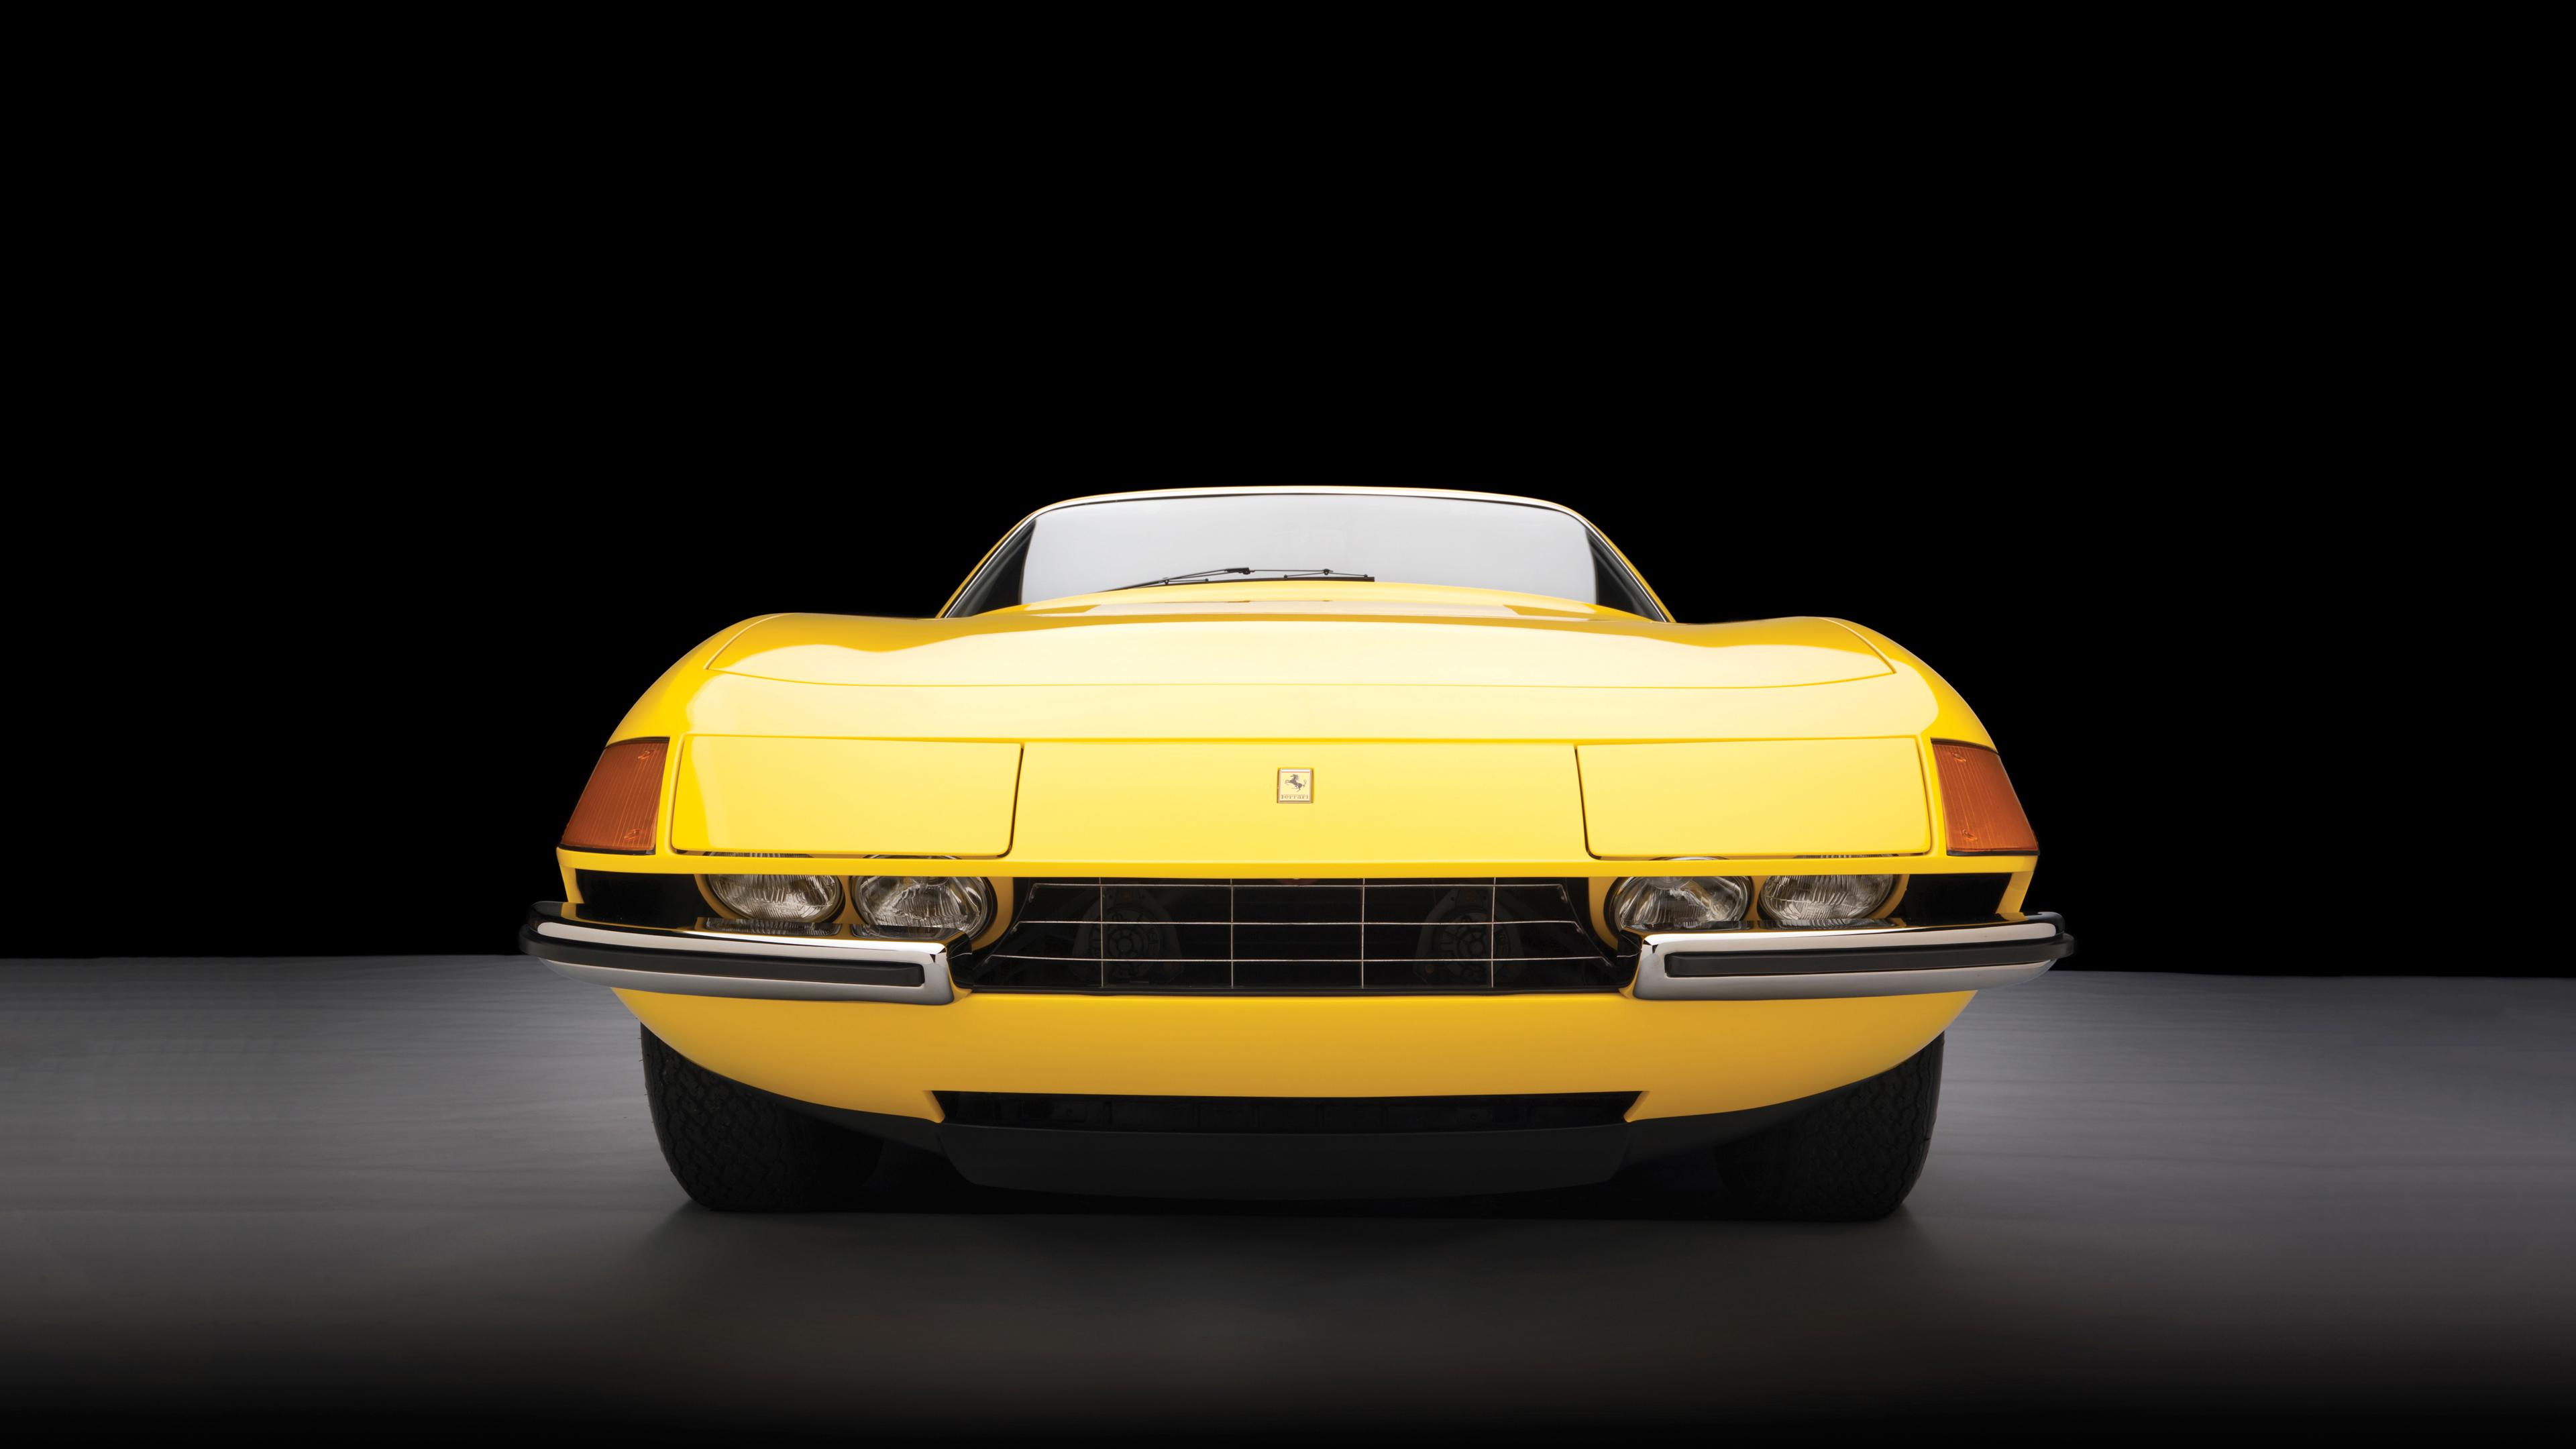 ferrari 365 gts daytona 4k 1608980444 - Ferrari 365 GTS Daytona 4k - Ferrari 365 GTS Daytona 4k wallpapers